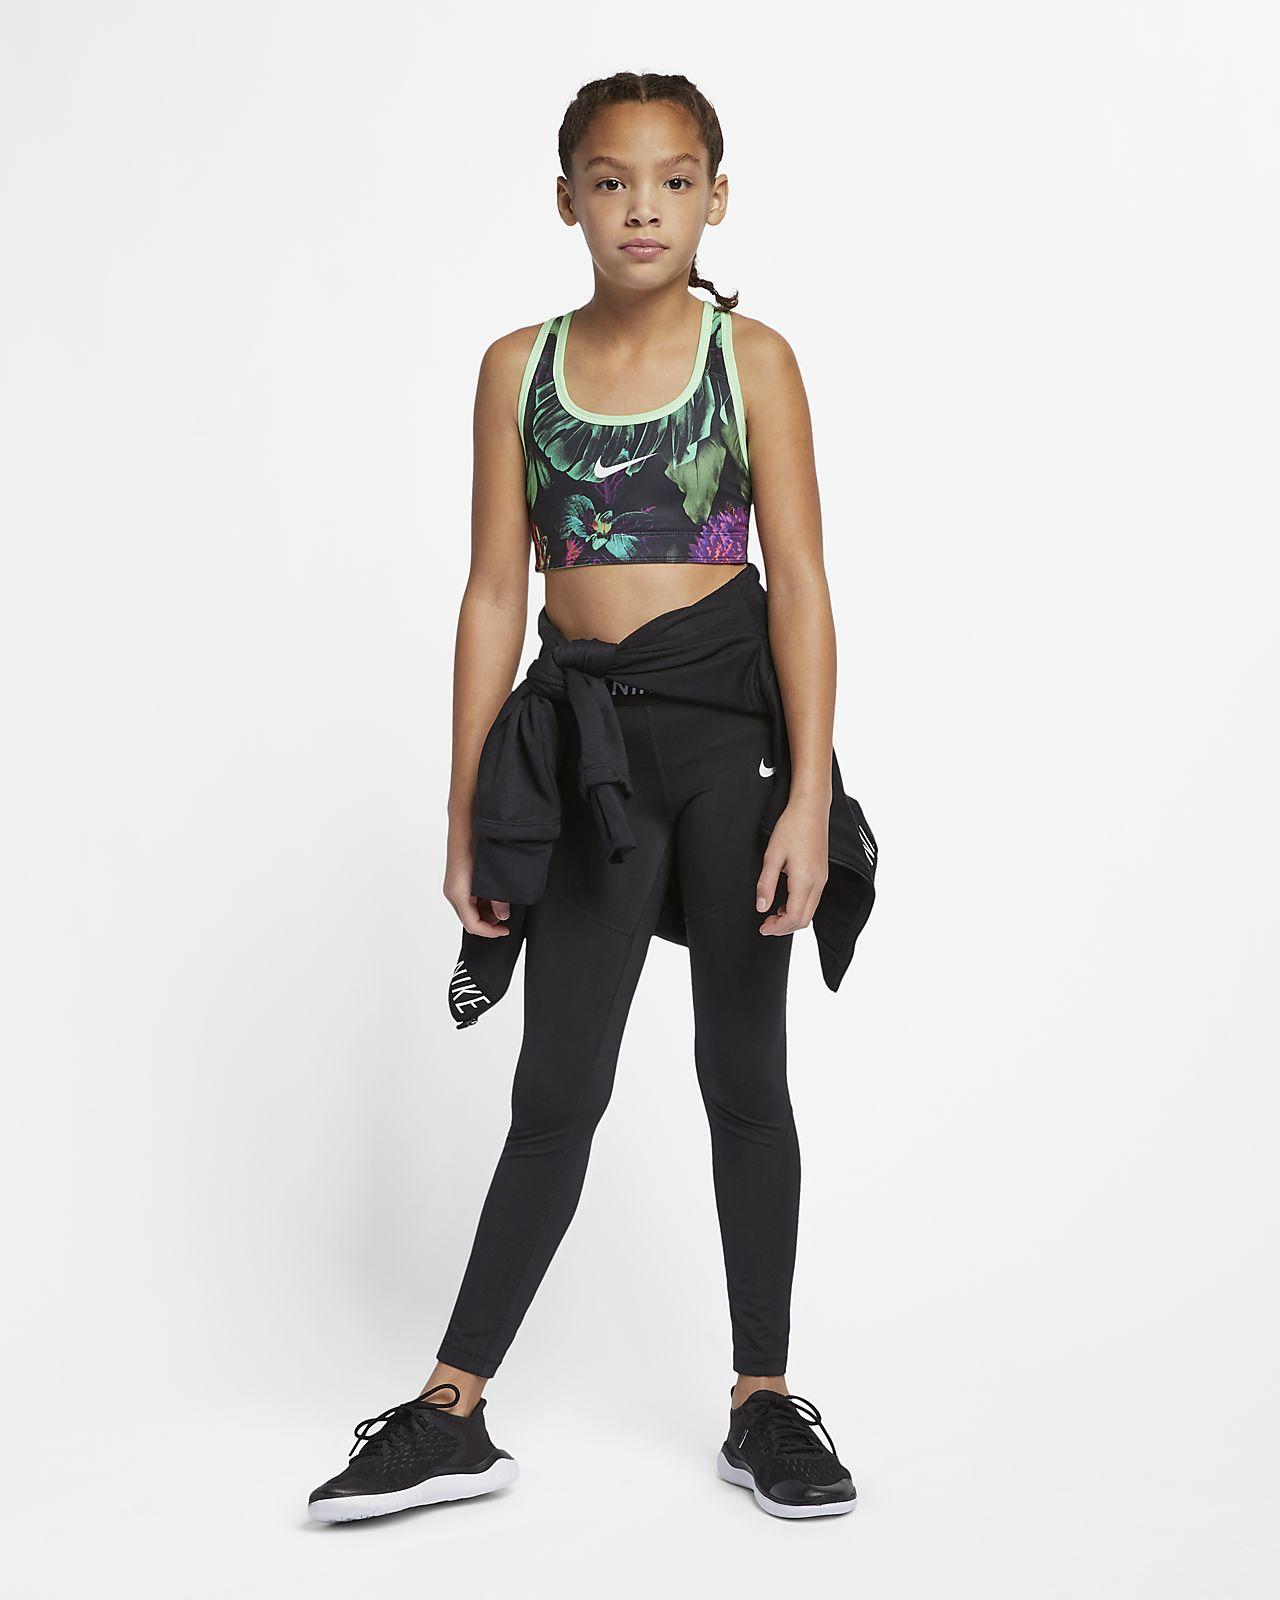 407bdfe87a86c ... Nike Classic Older Kids  (Girls ) Reversible Printed Floral Sports Bra